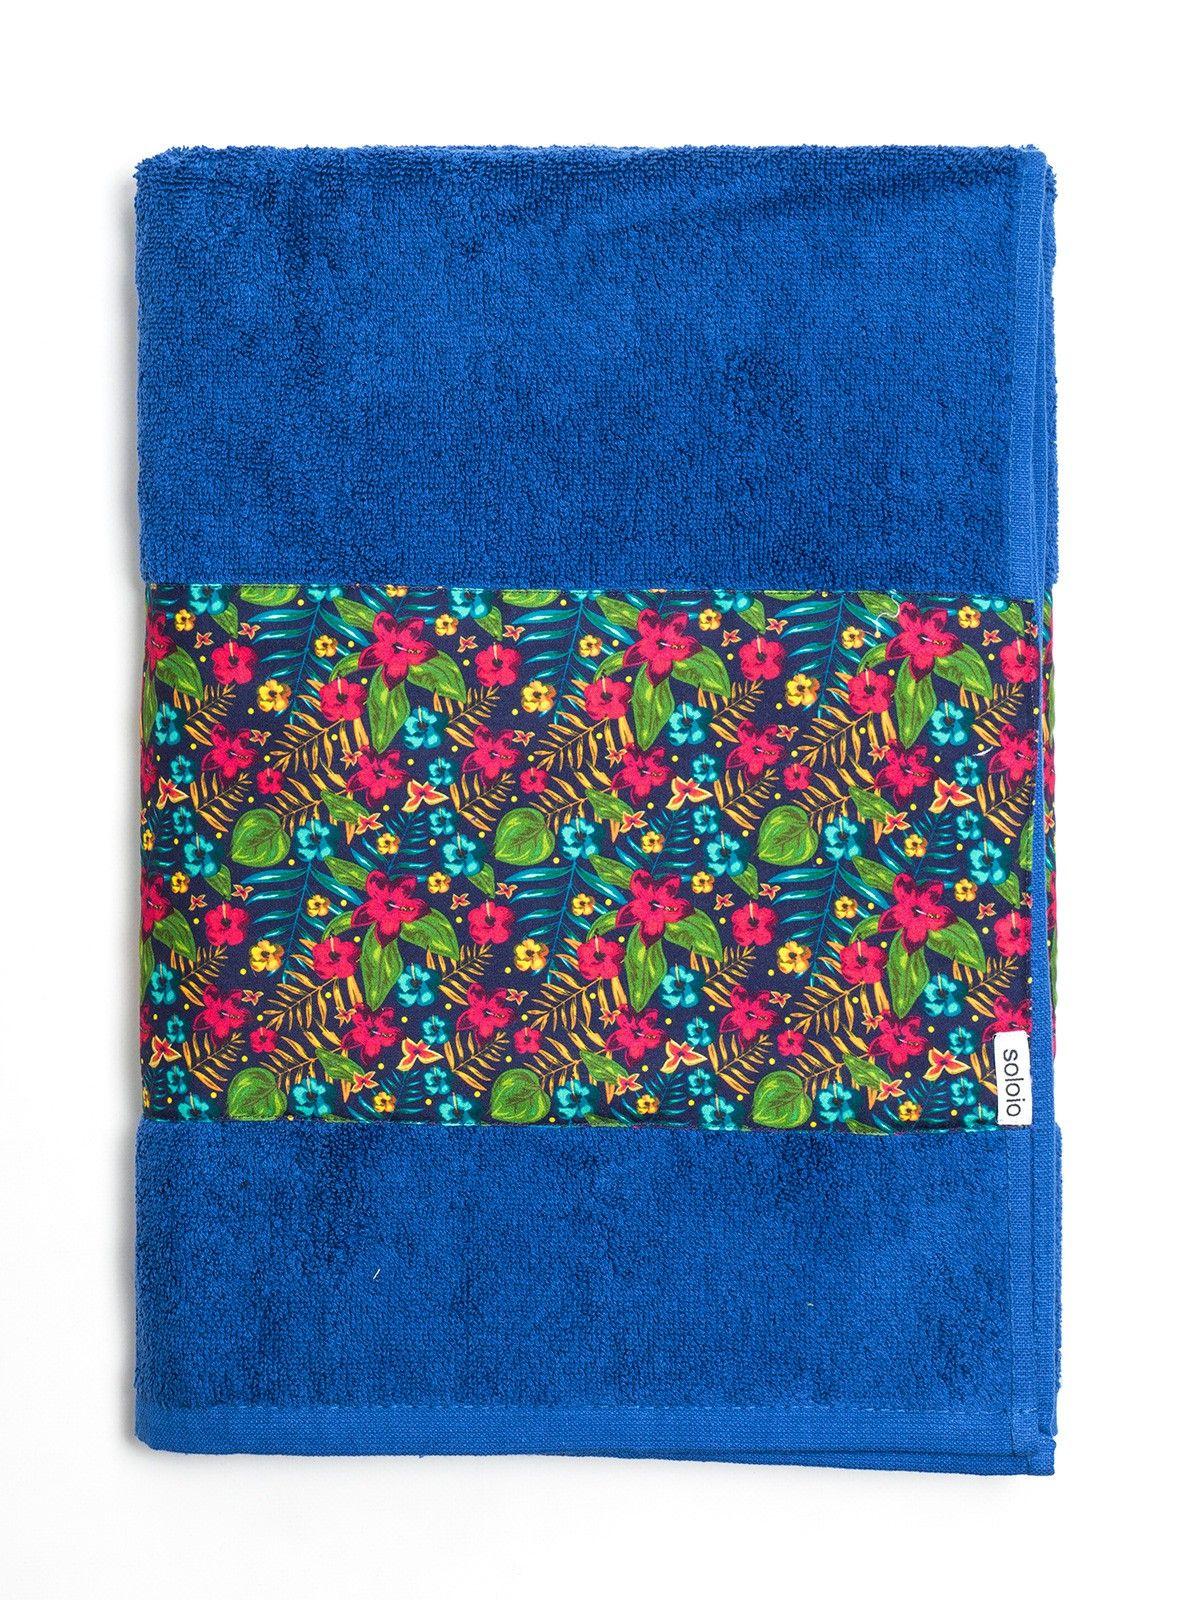 http://www.soloio.com/swim-summer/toalla-azul-algodon-estampada-flores-tropicales-verde-rosa-turquesa.html